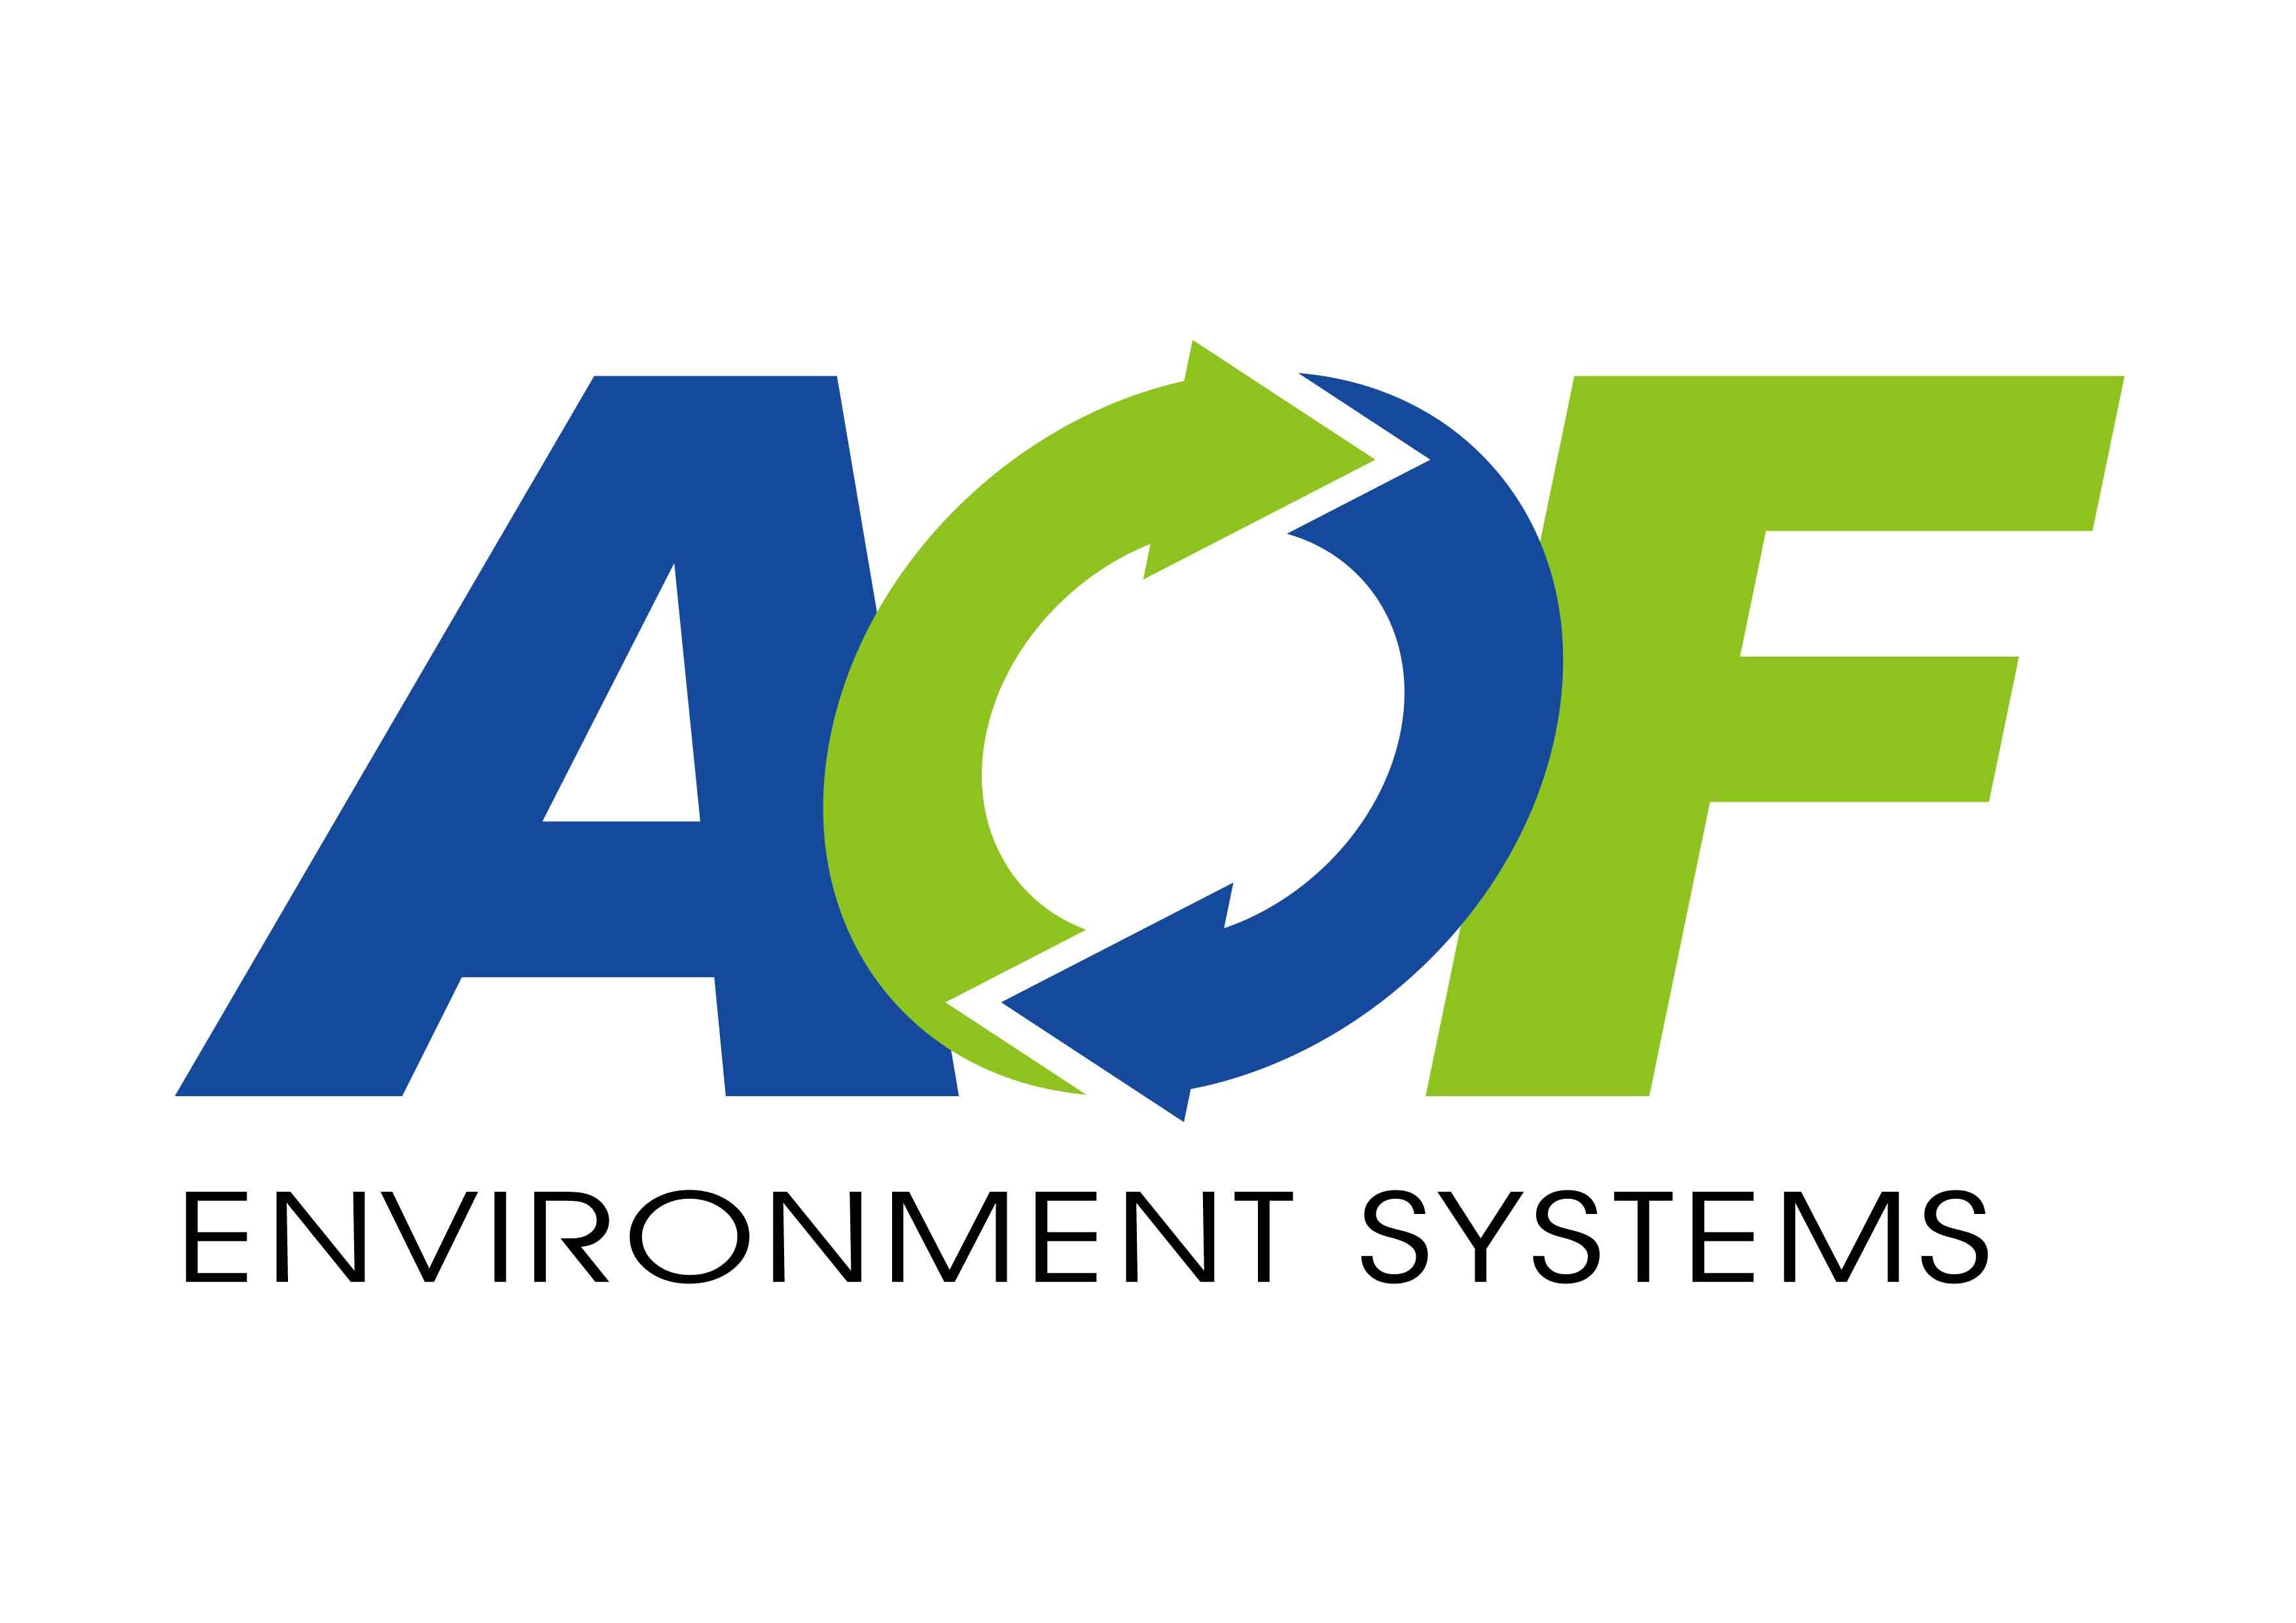 AIR-O-FILTER ENVIRONMENT SYSTEMS, INC.